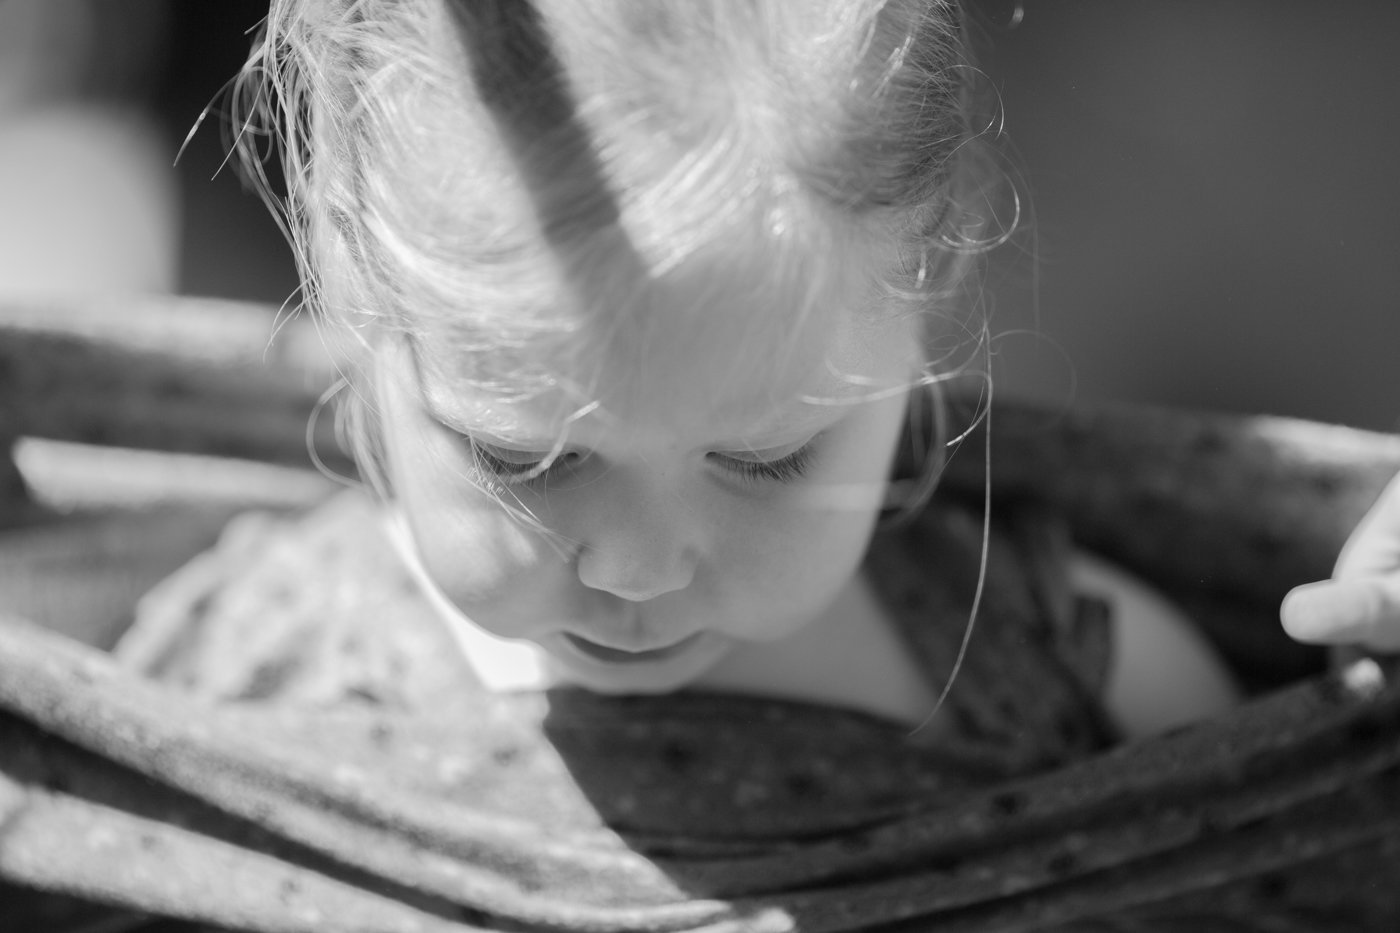 foto jong kind met jurk - © Janneke Walter, kinderfotograaf omgeving Utrecht